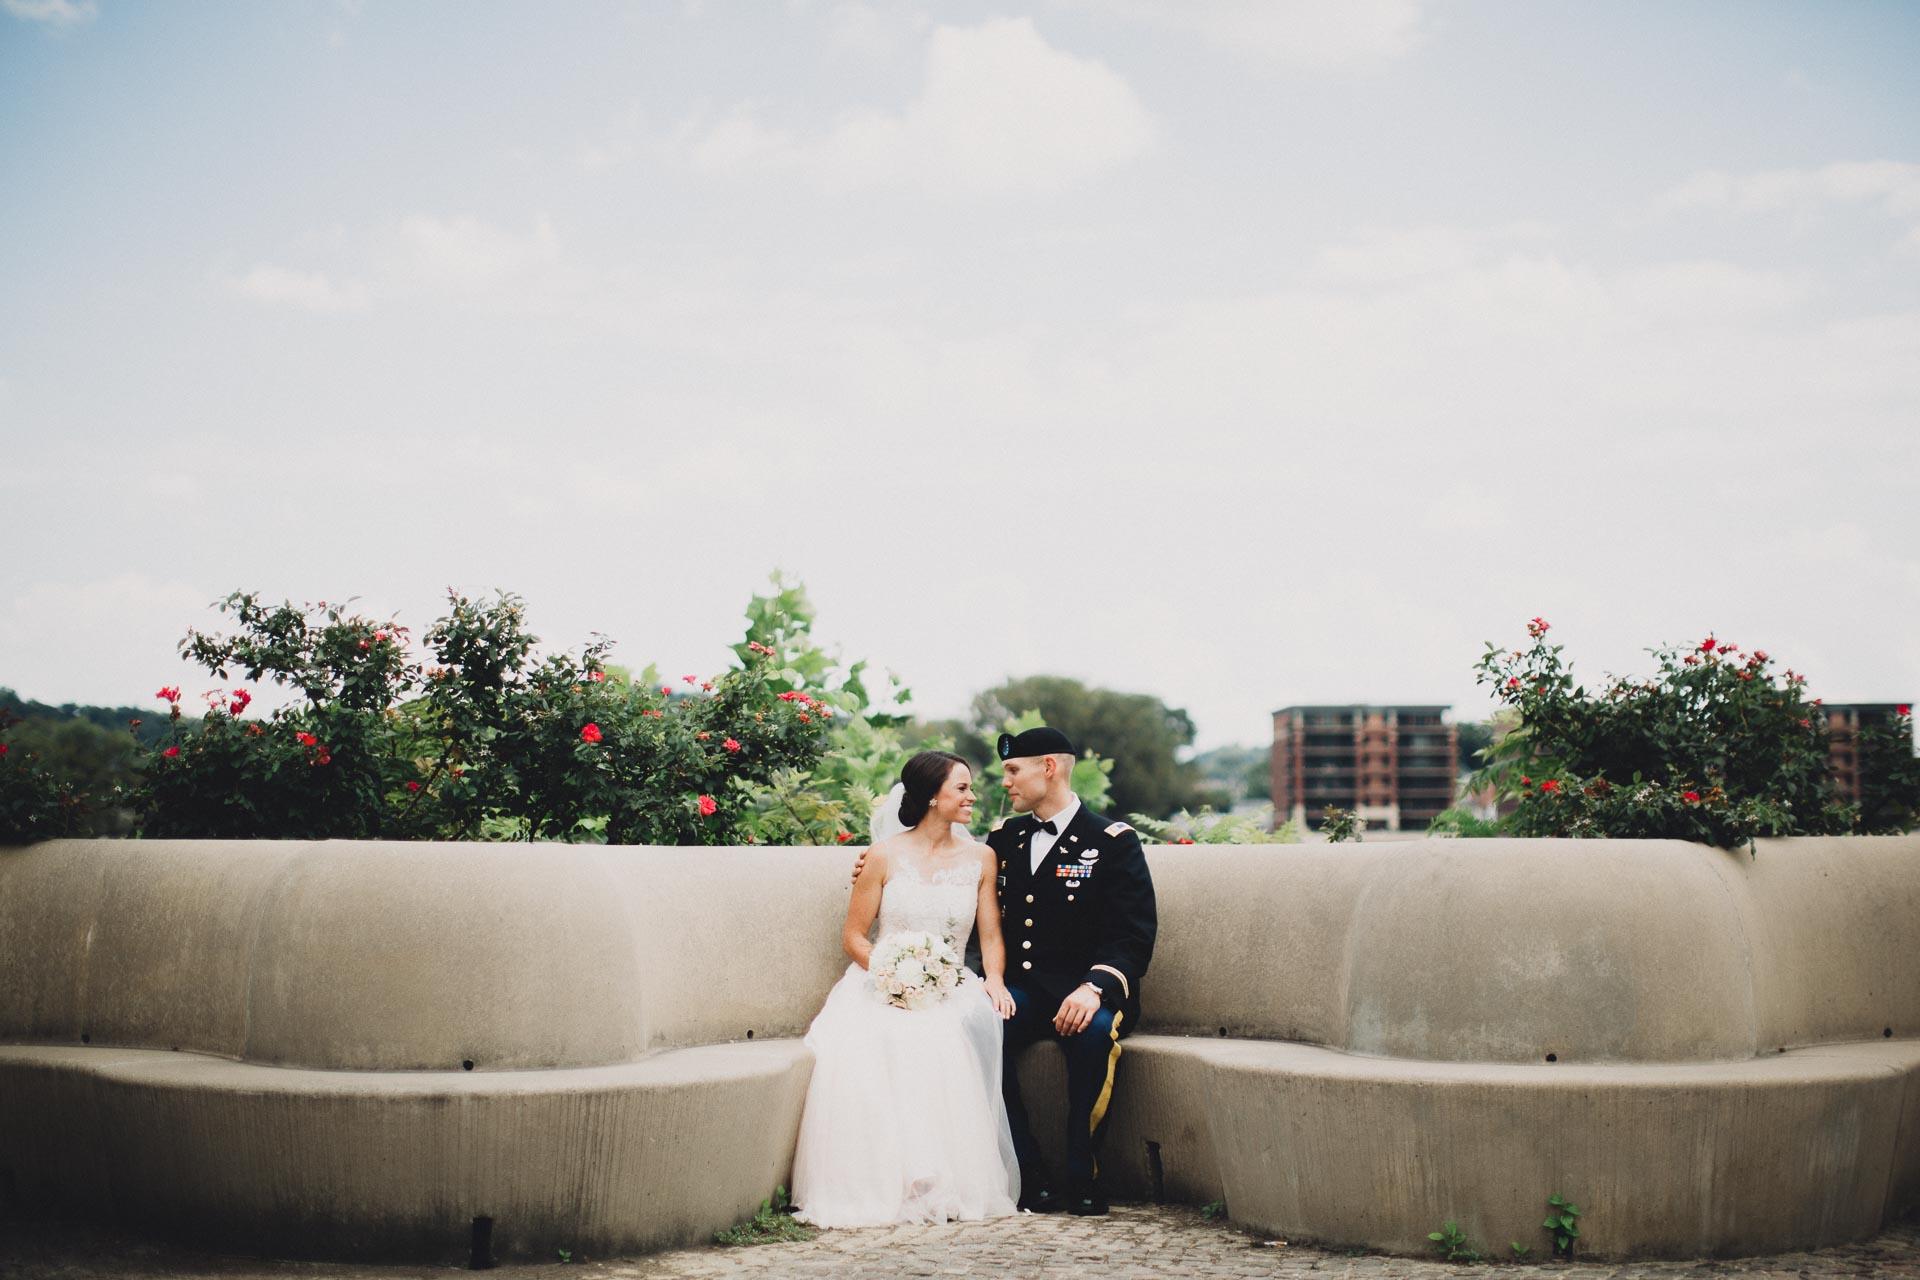 Emily-Eddie-Cincinnati-Rennaissance-Hotel-Wedding-052@2x.jpg